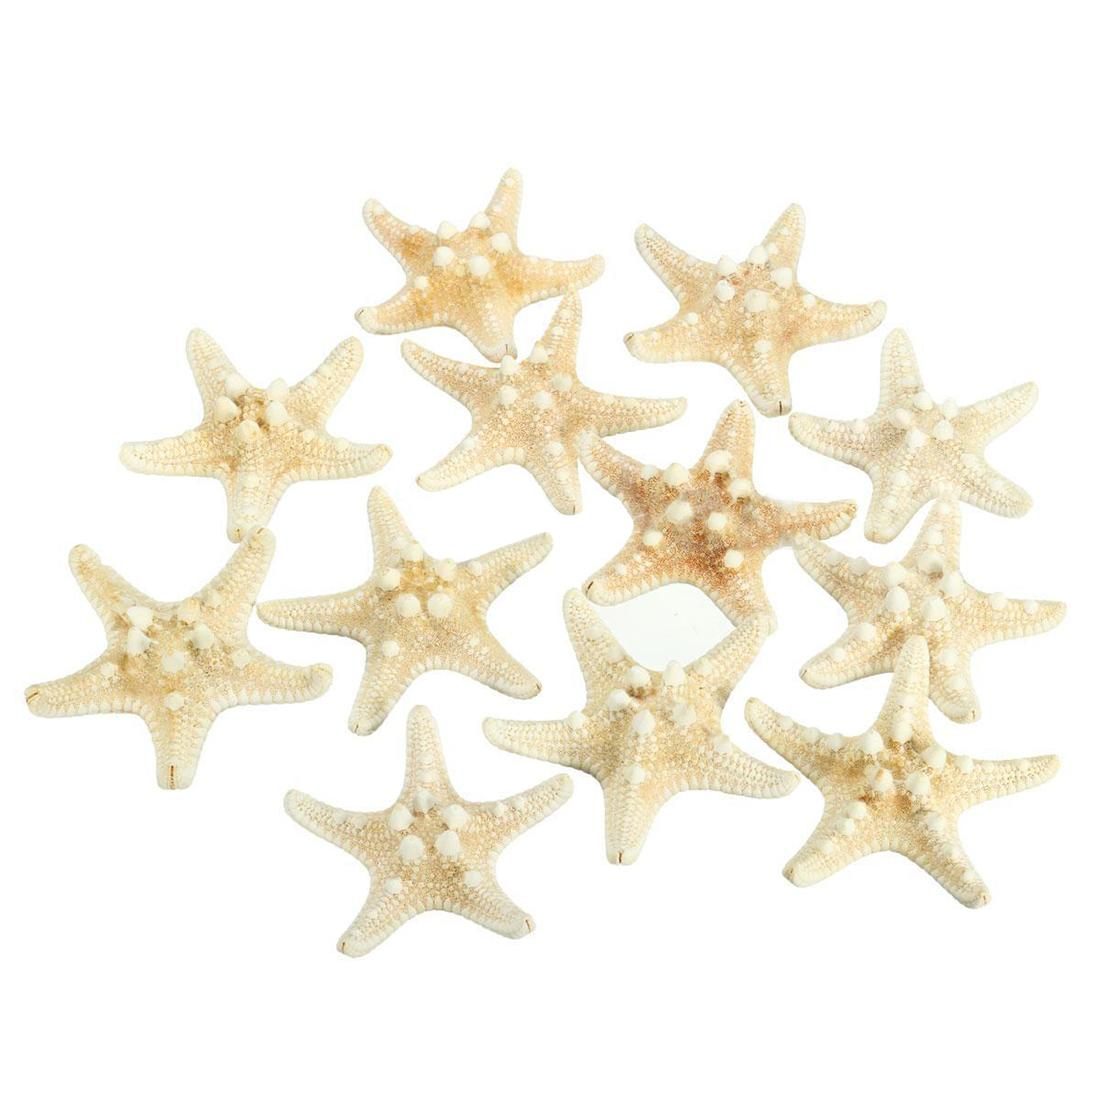 12 X White Knobby Starfish 5cm -7cm Sea Star Shell Beach Wedding Display Craft Decor By Ertic.